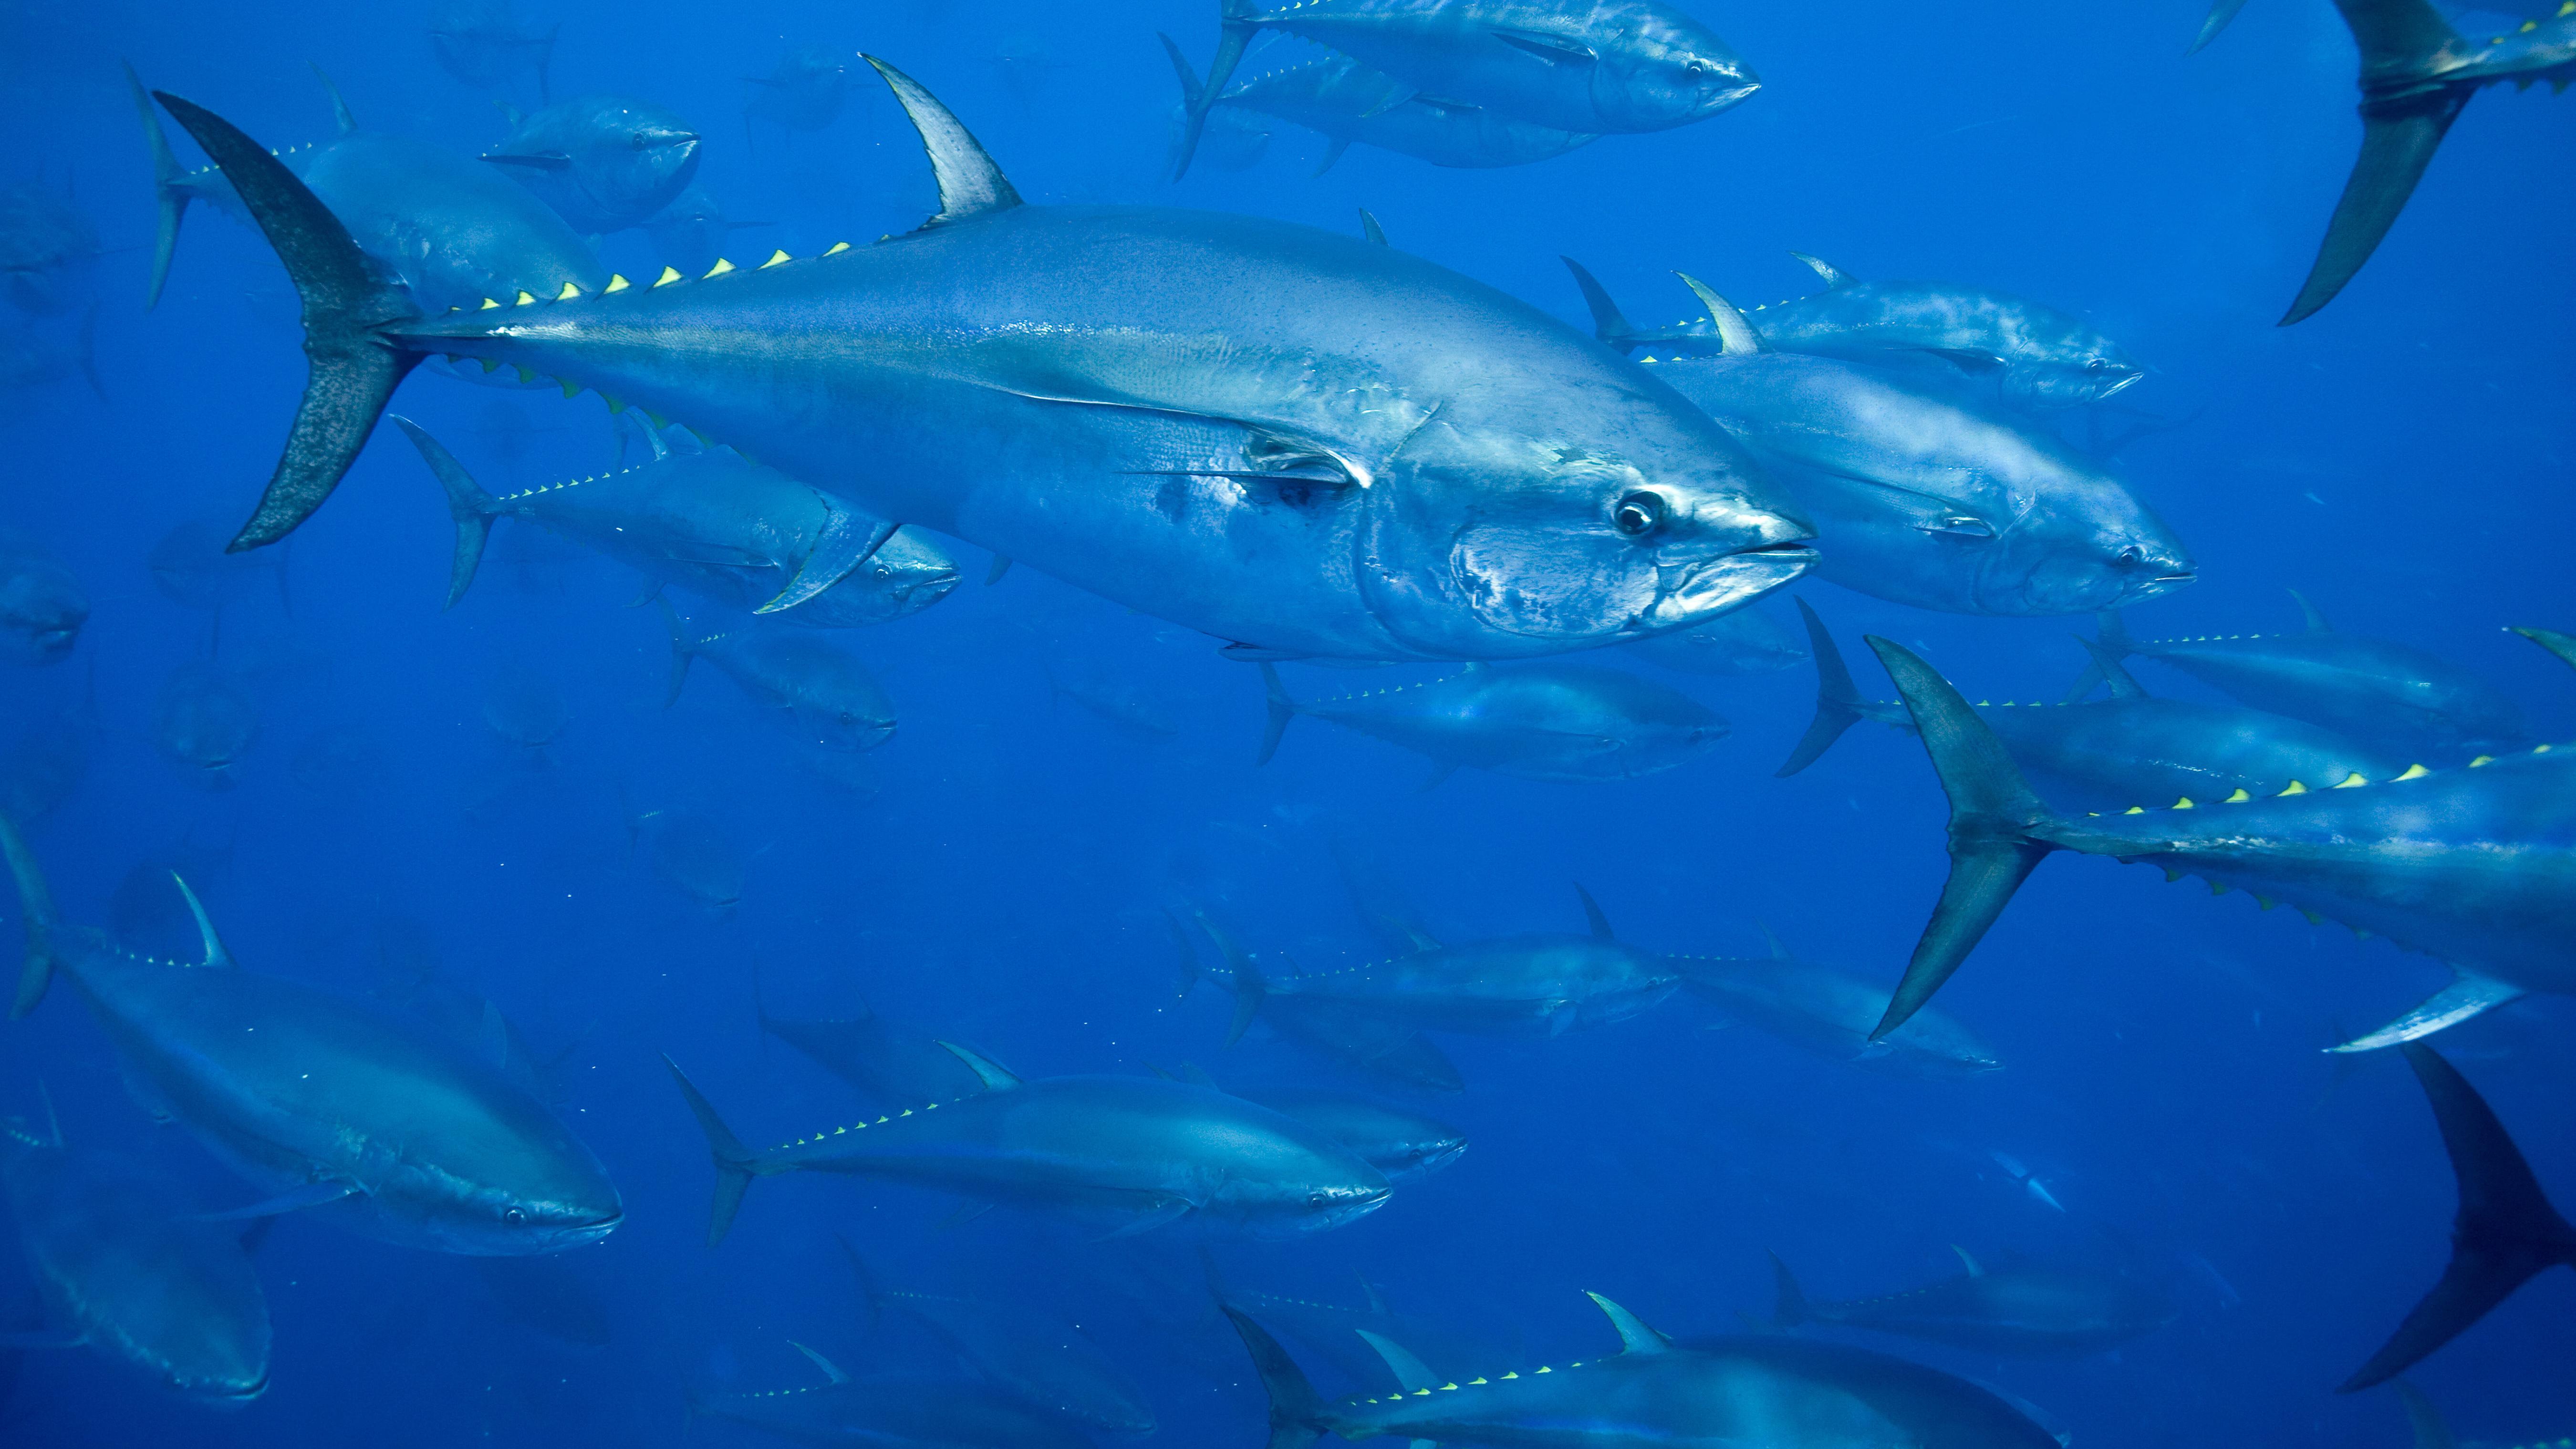 Protecting Atlantic Bluefin Tuna | The Pew Charitable Trusts